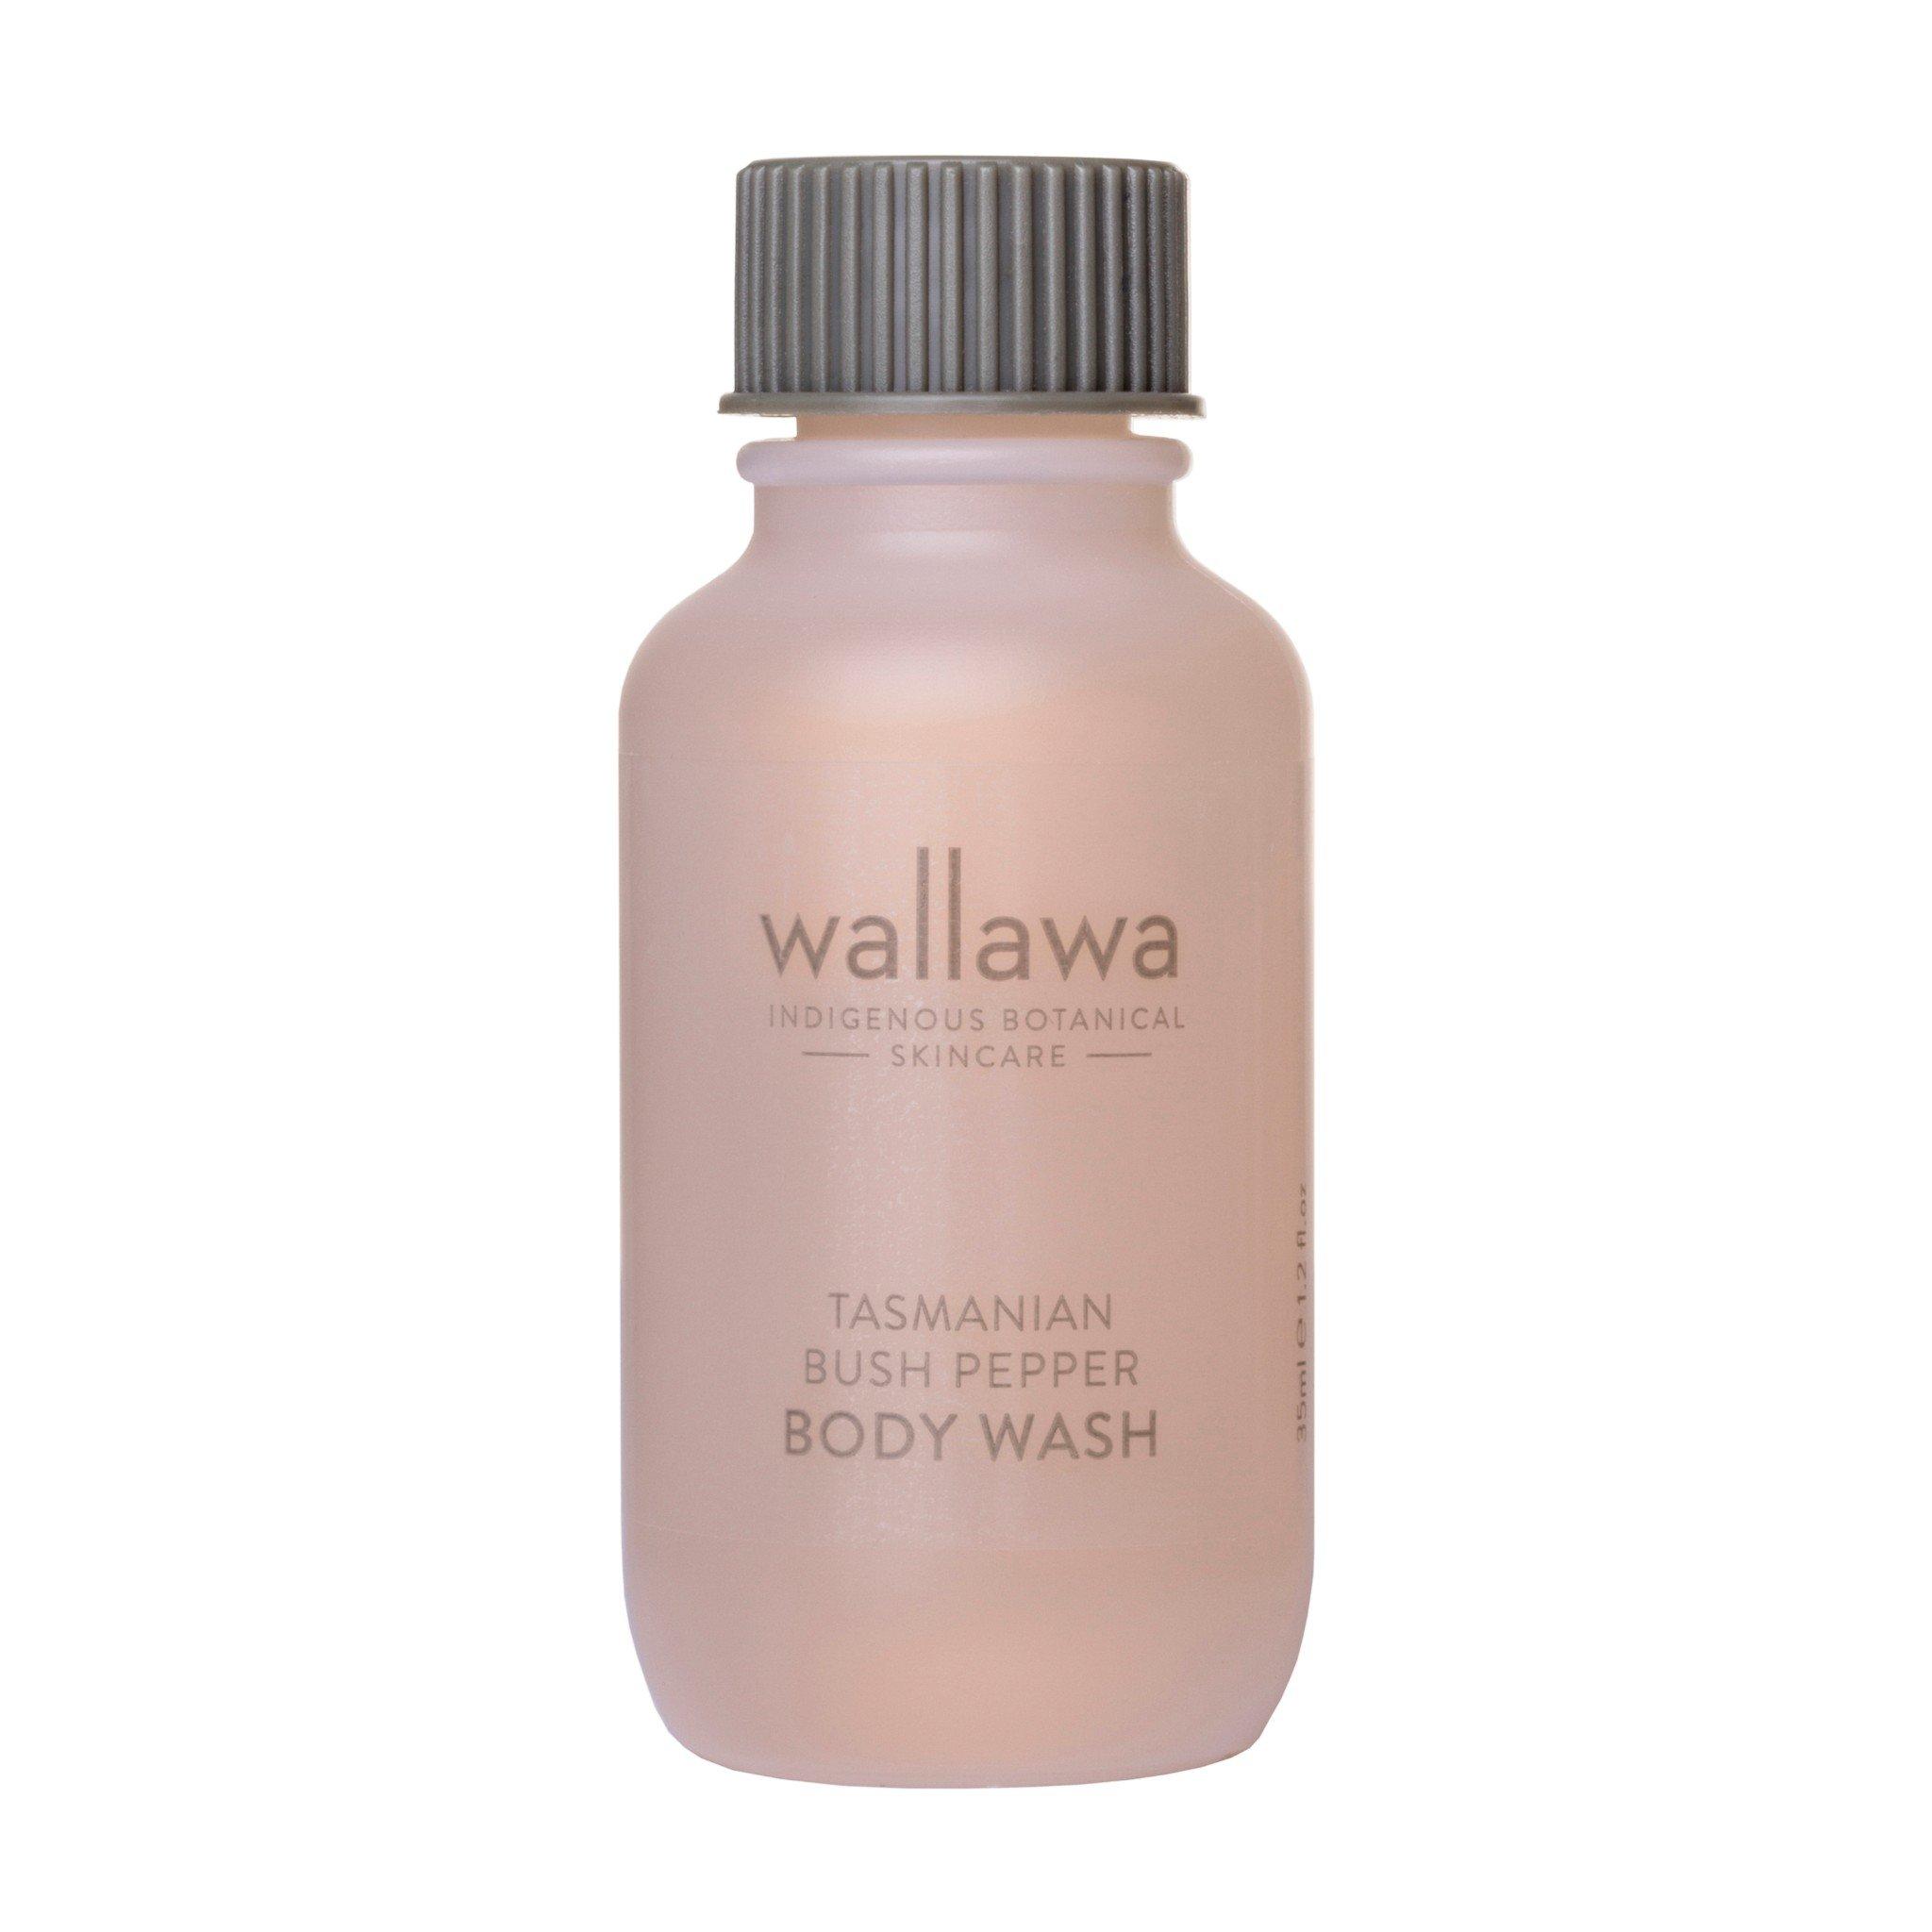 Wallawa Body Wash (50 units)